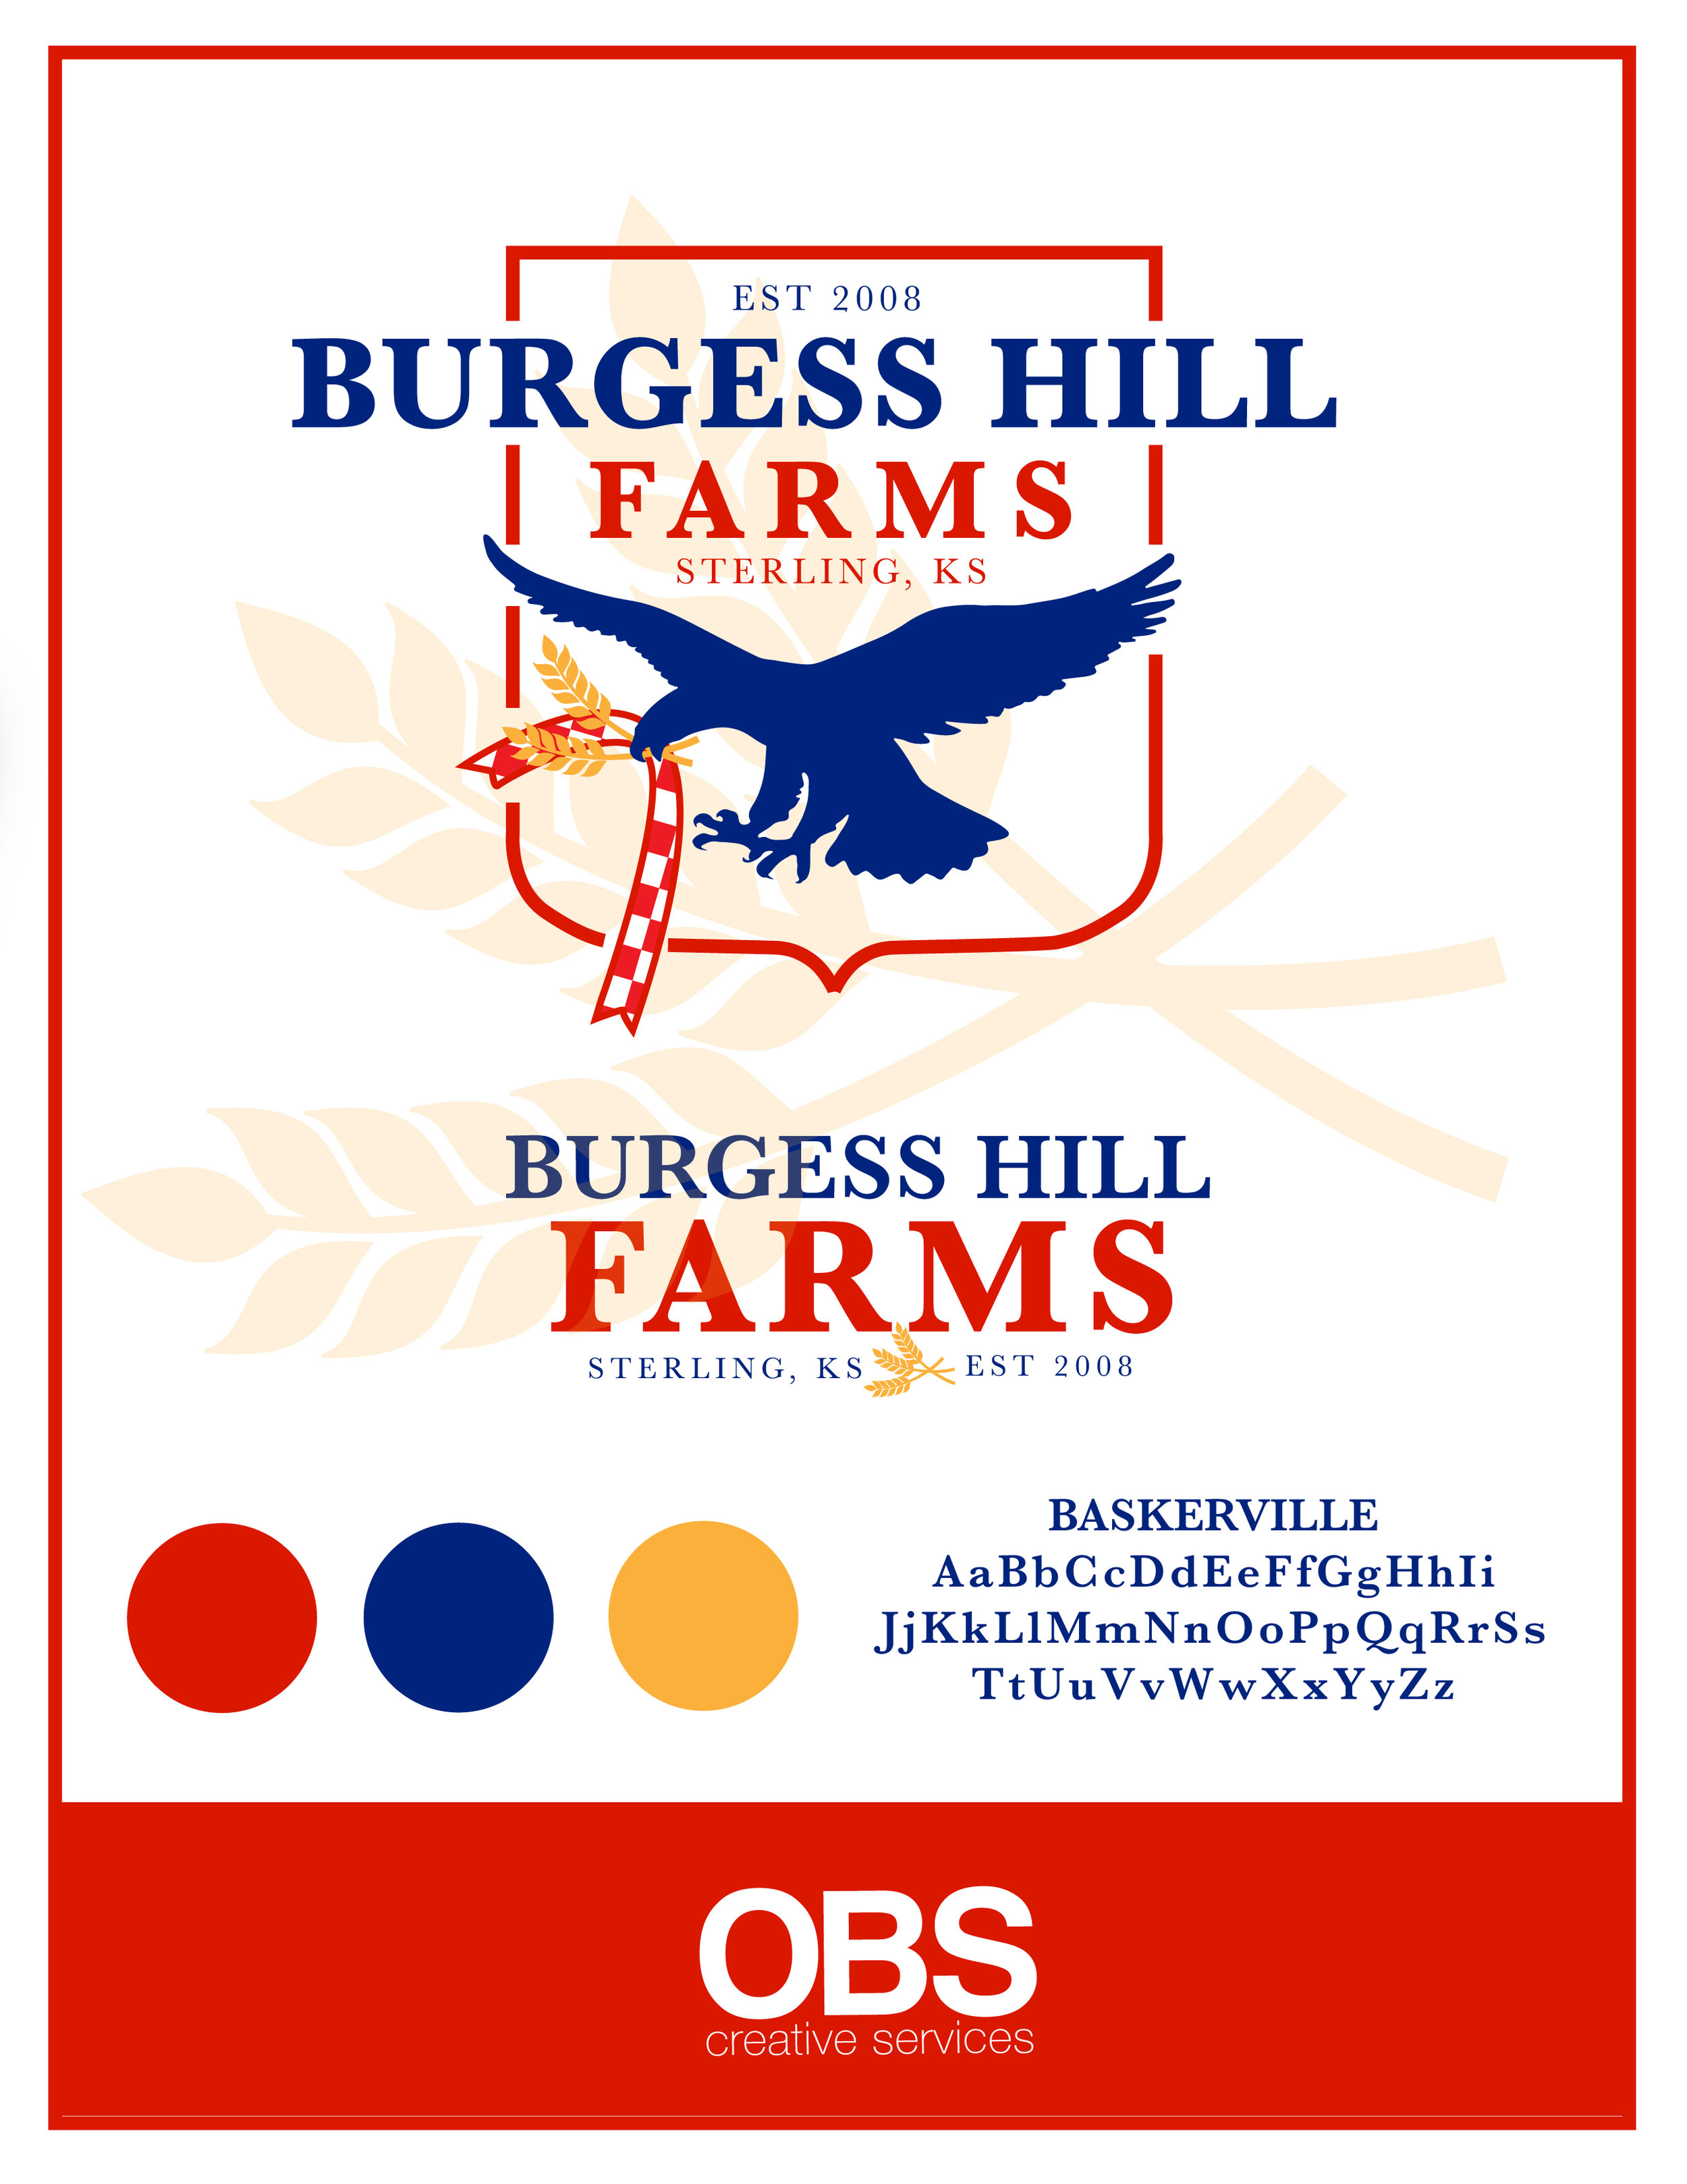 Burgess Hill Farms.jpg